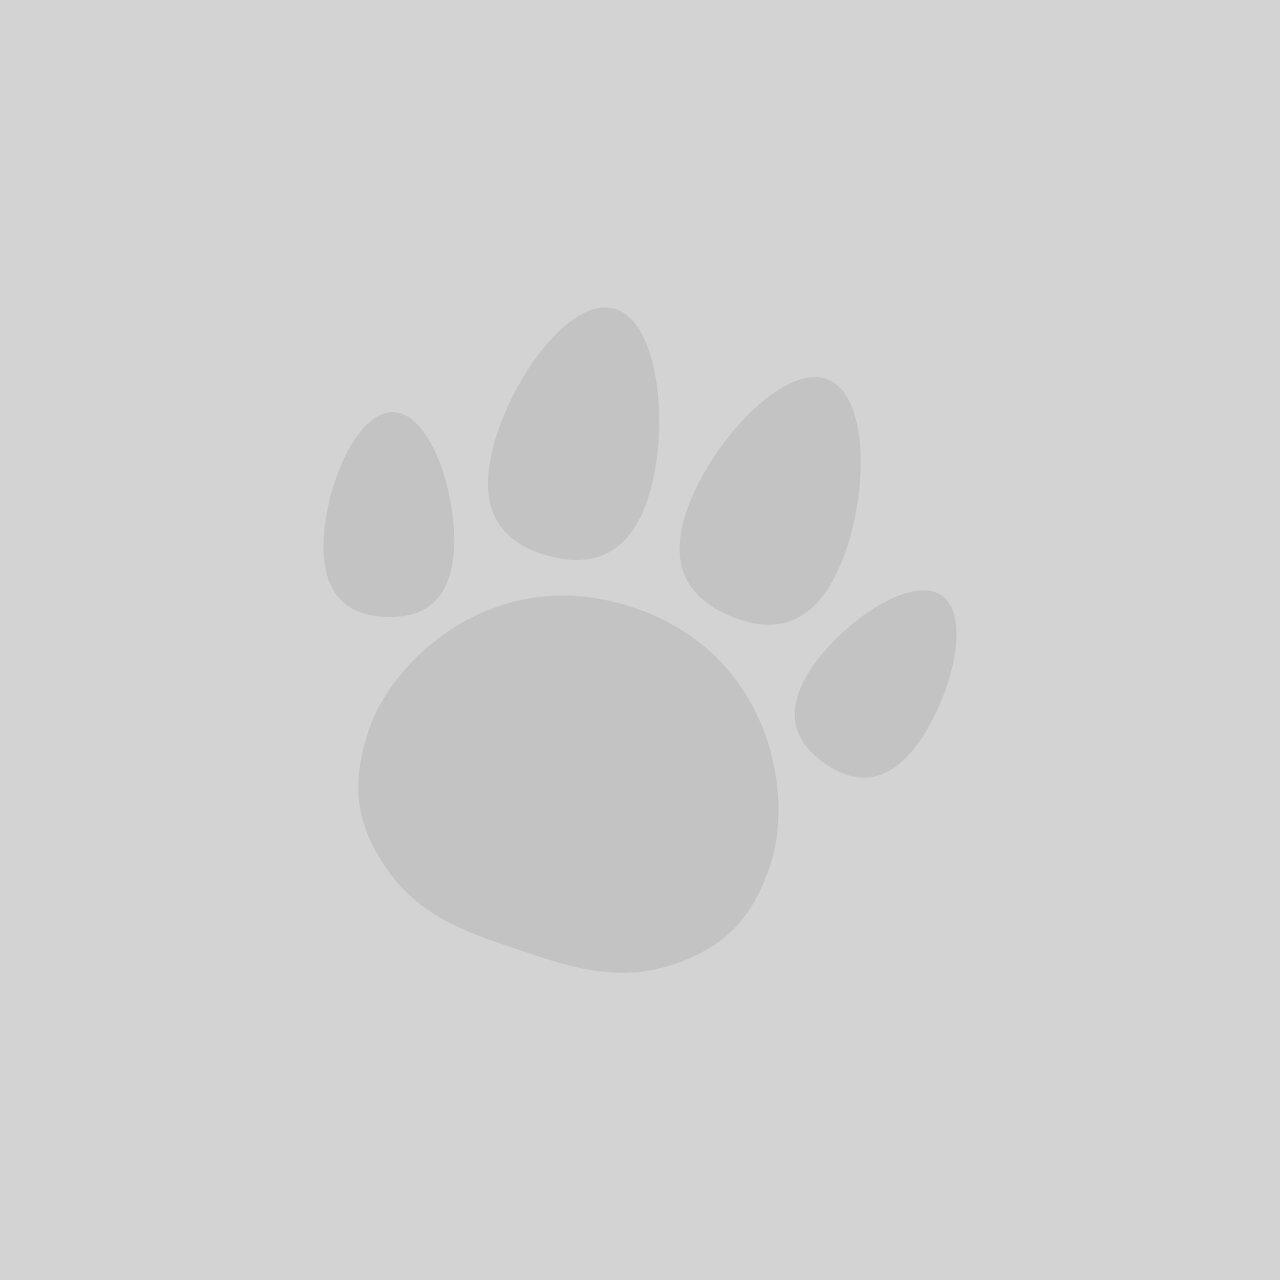 Doodlebone Airmesh Dog Harness Cyan (size options)